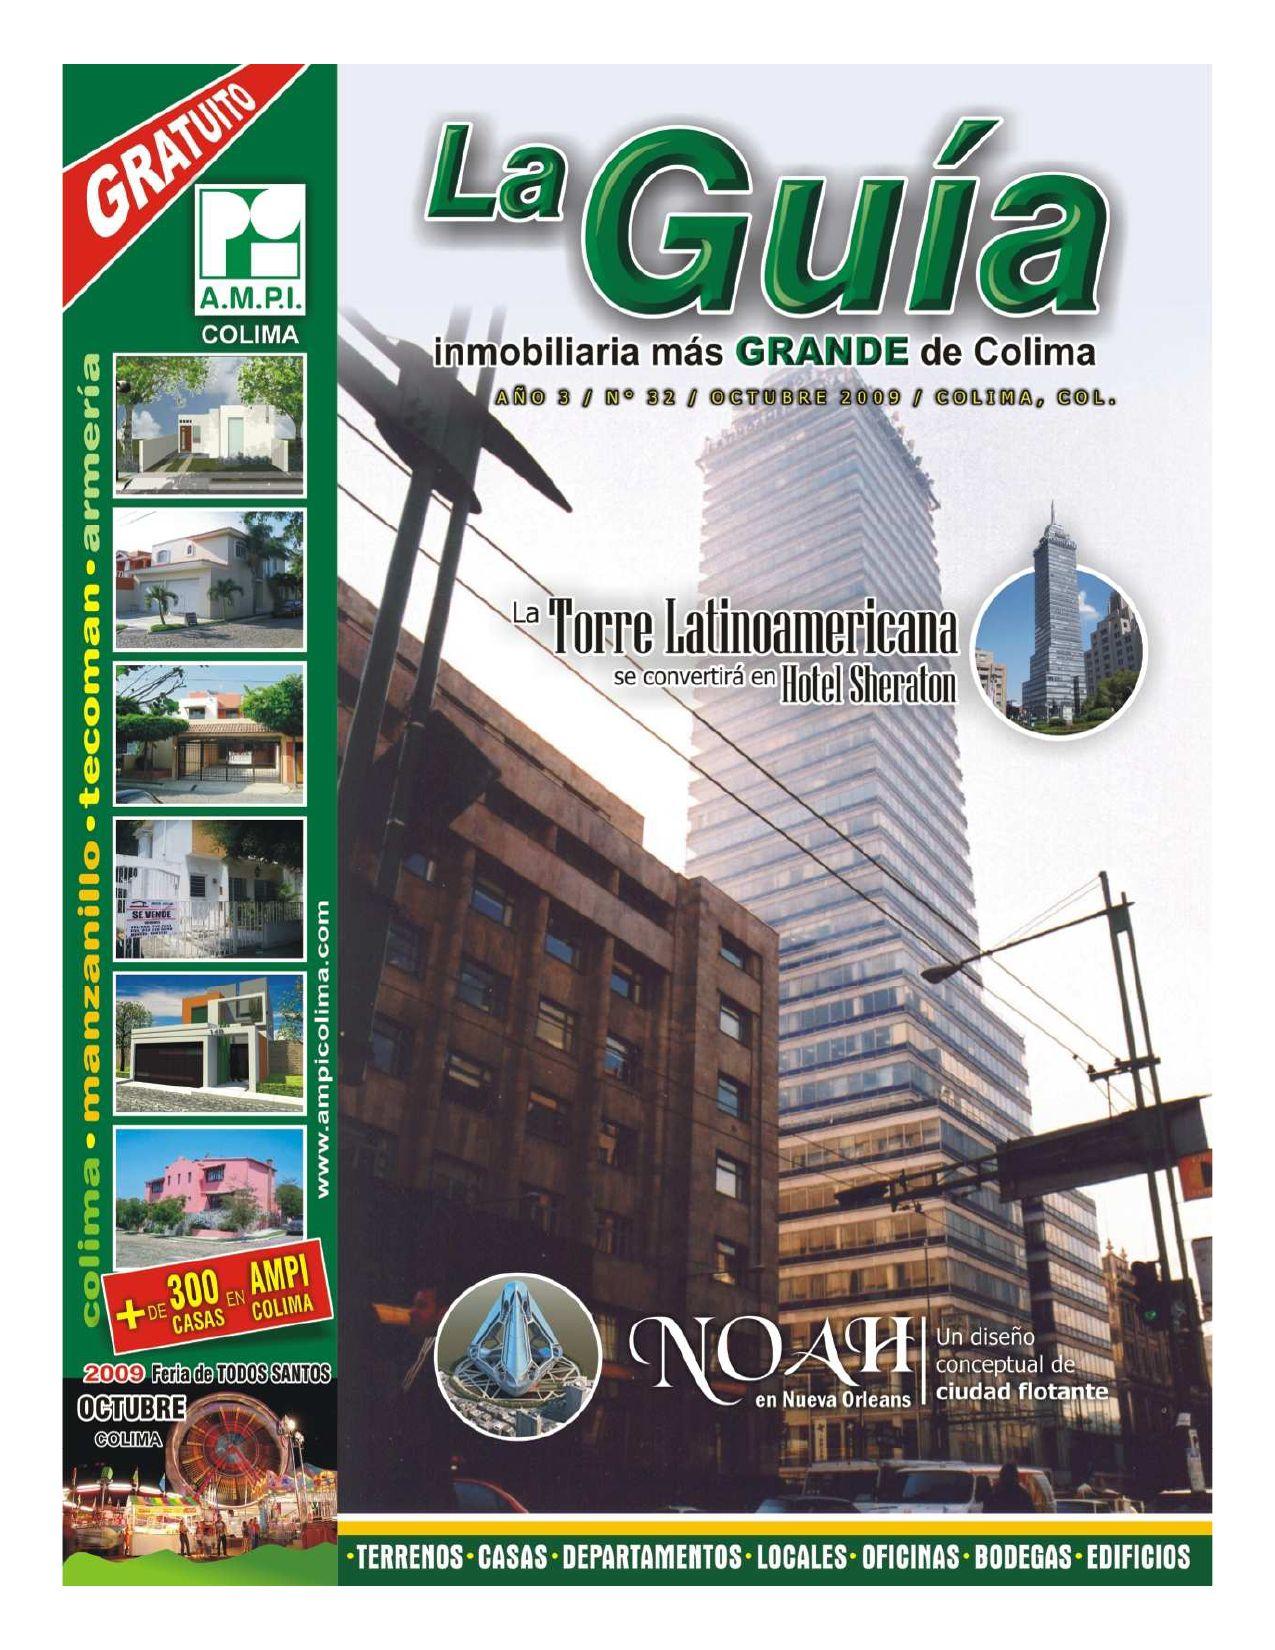 La guia inmobiliaria de colima by edgar candor issuu for Guia inmobiliaria